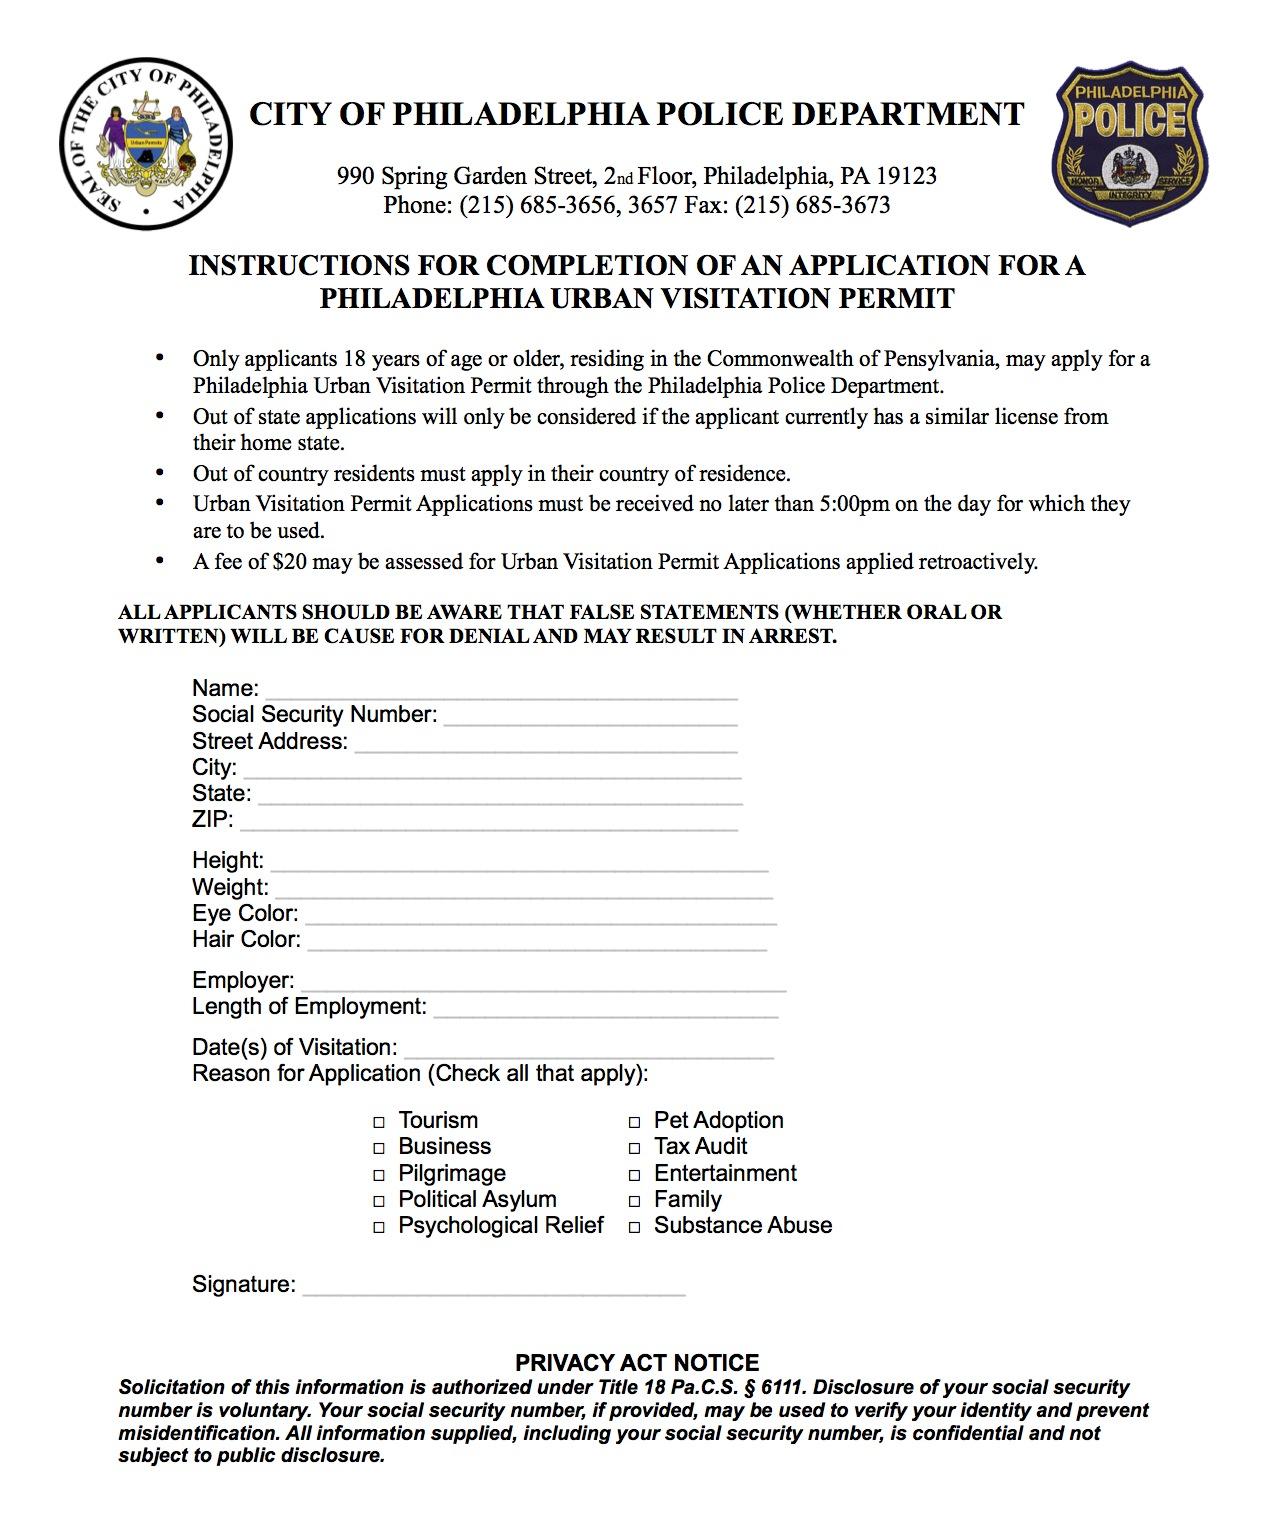 Permit For Visiting Philadelphia?